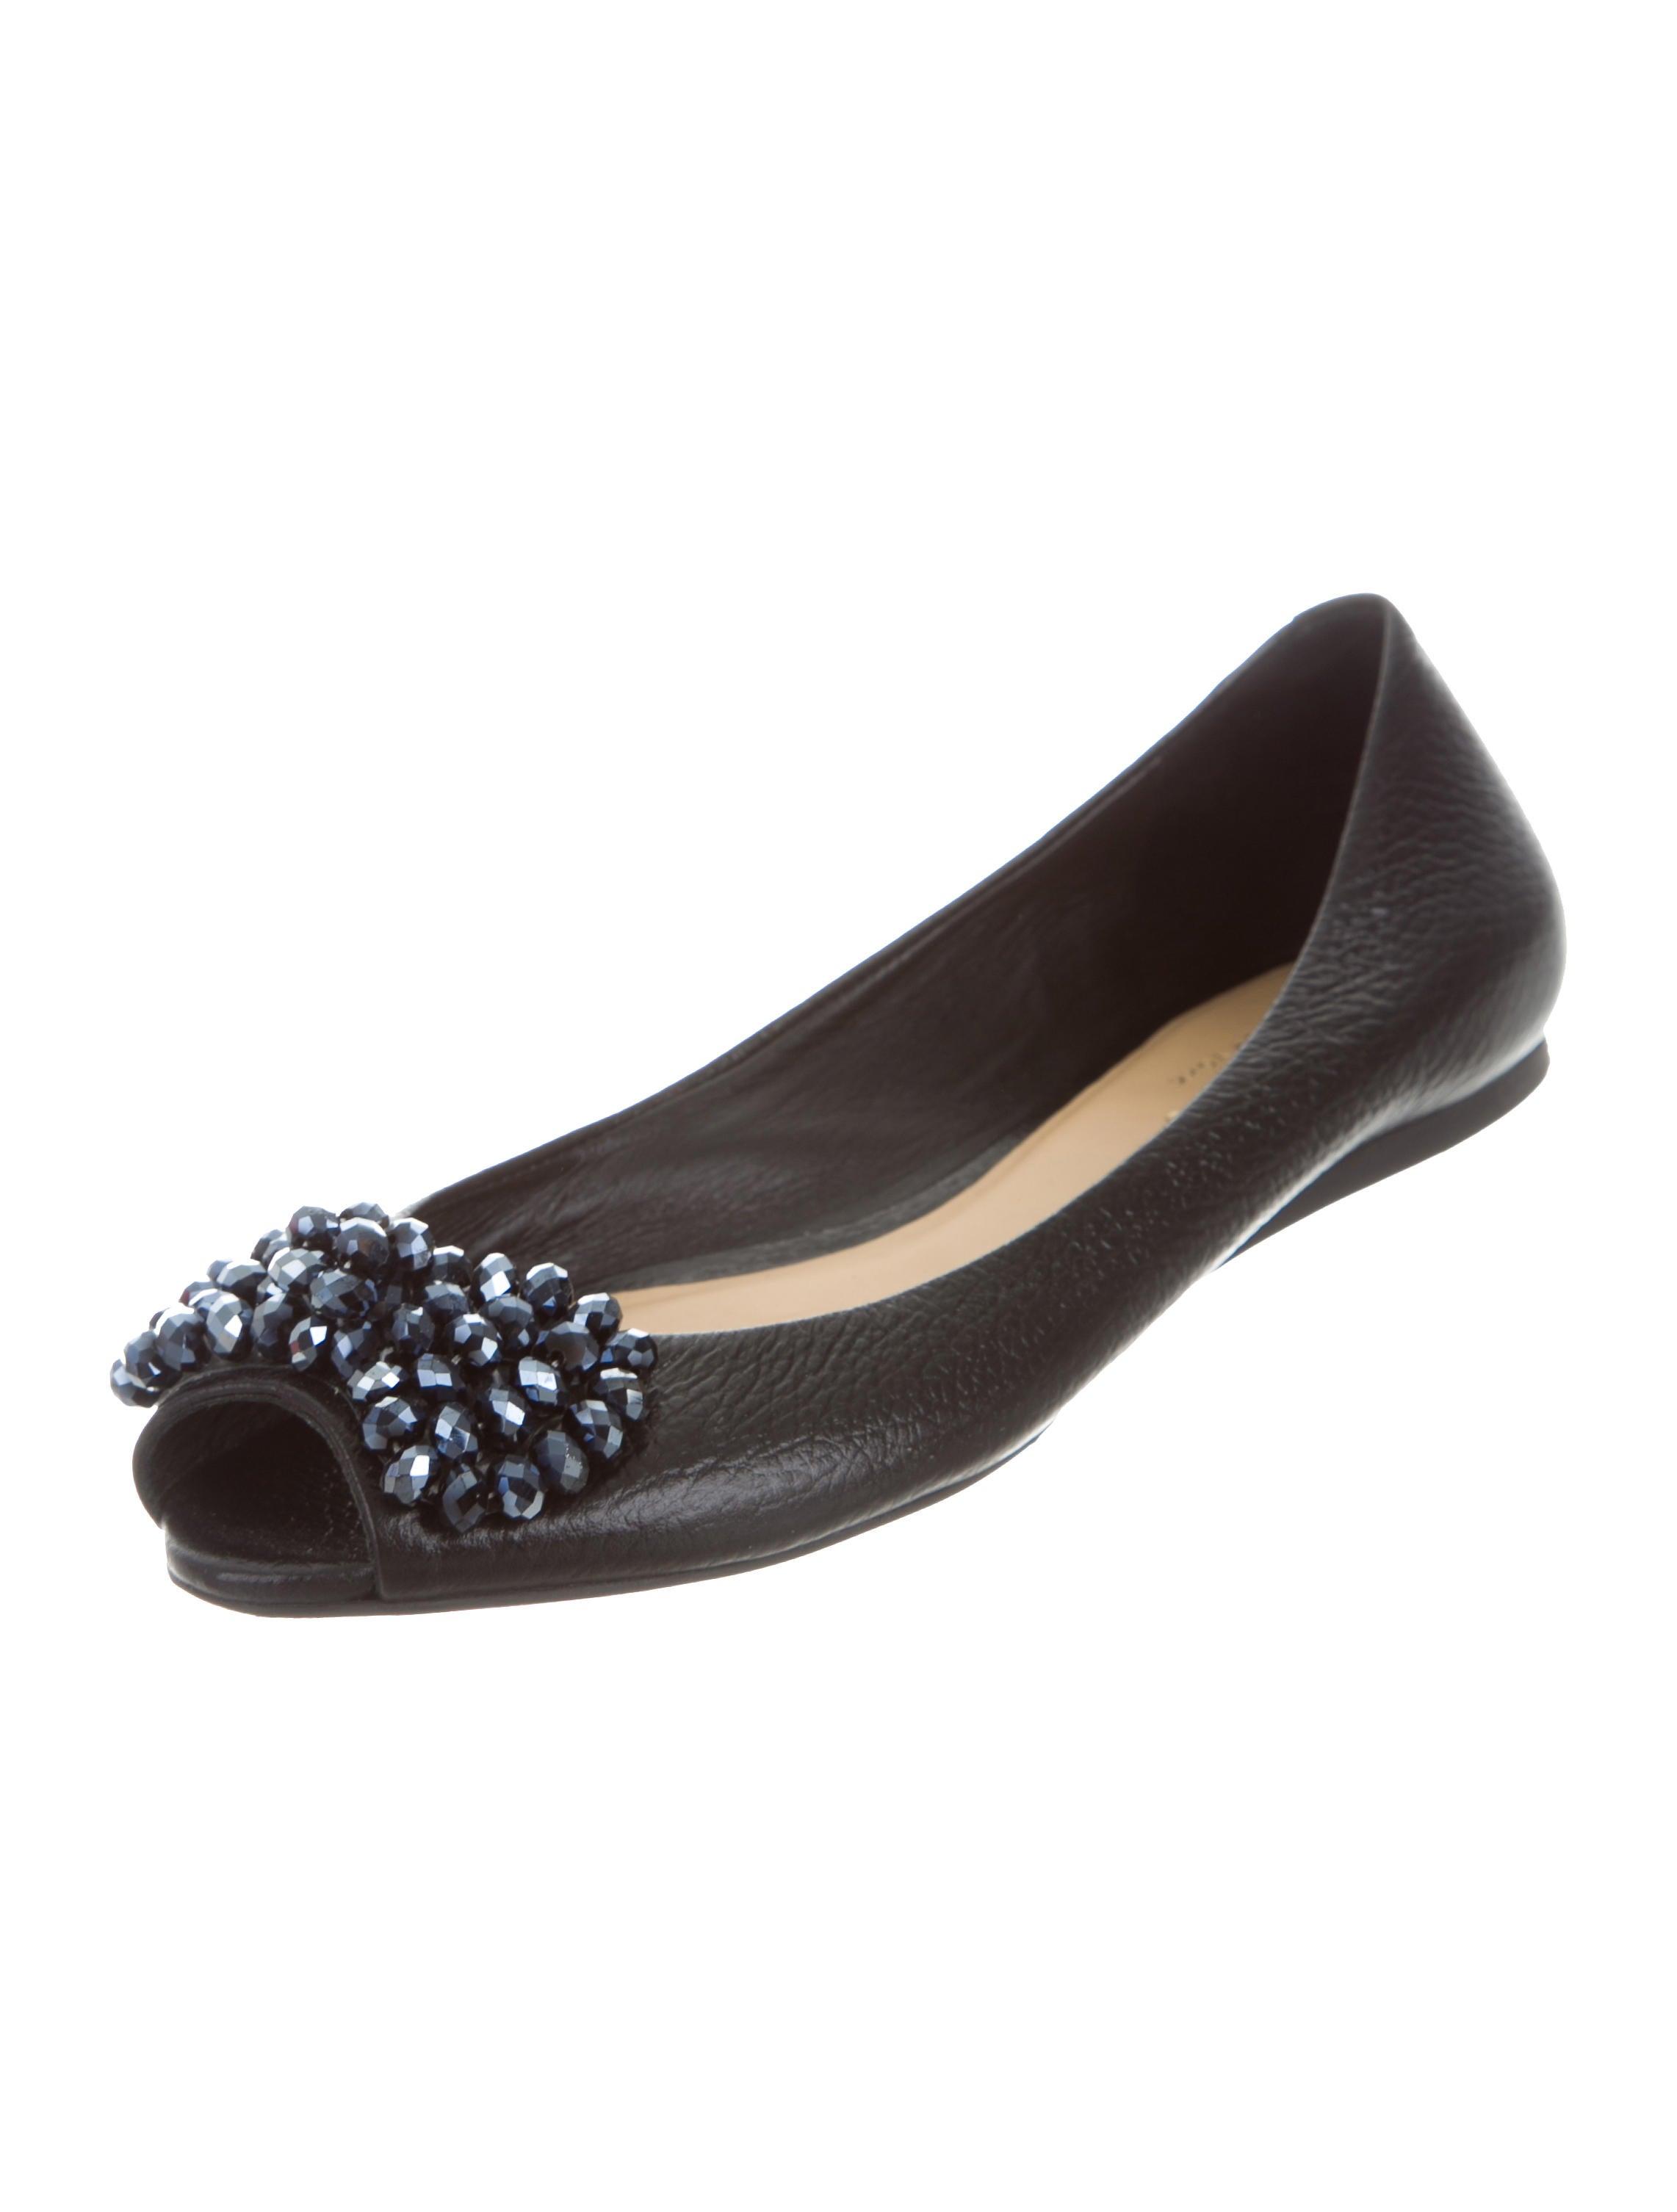 Kate spade new york leather peep toe flats shoes for Kate spade new york flats